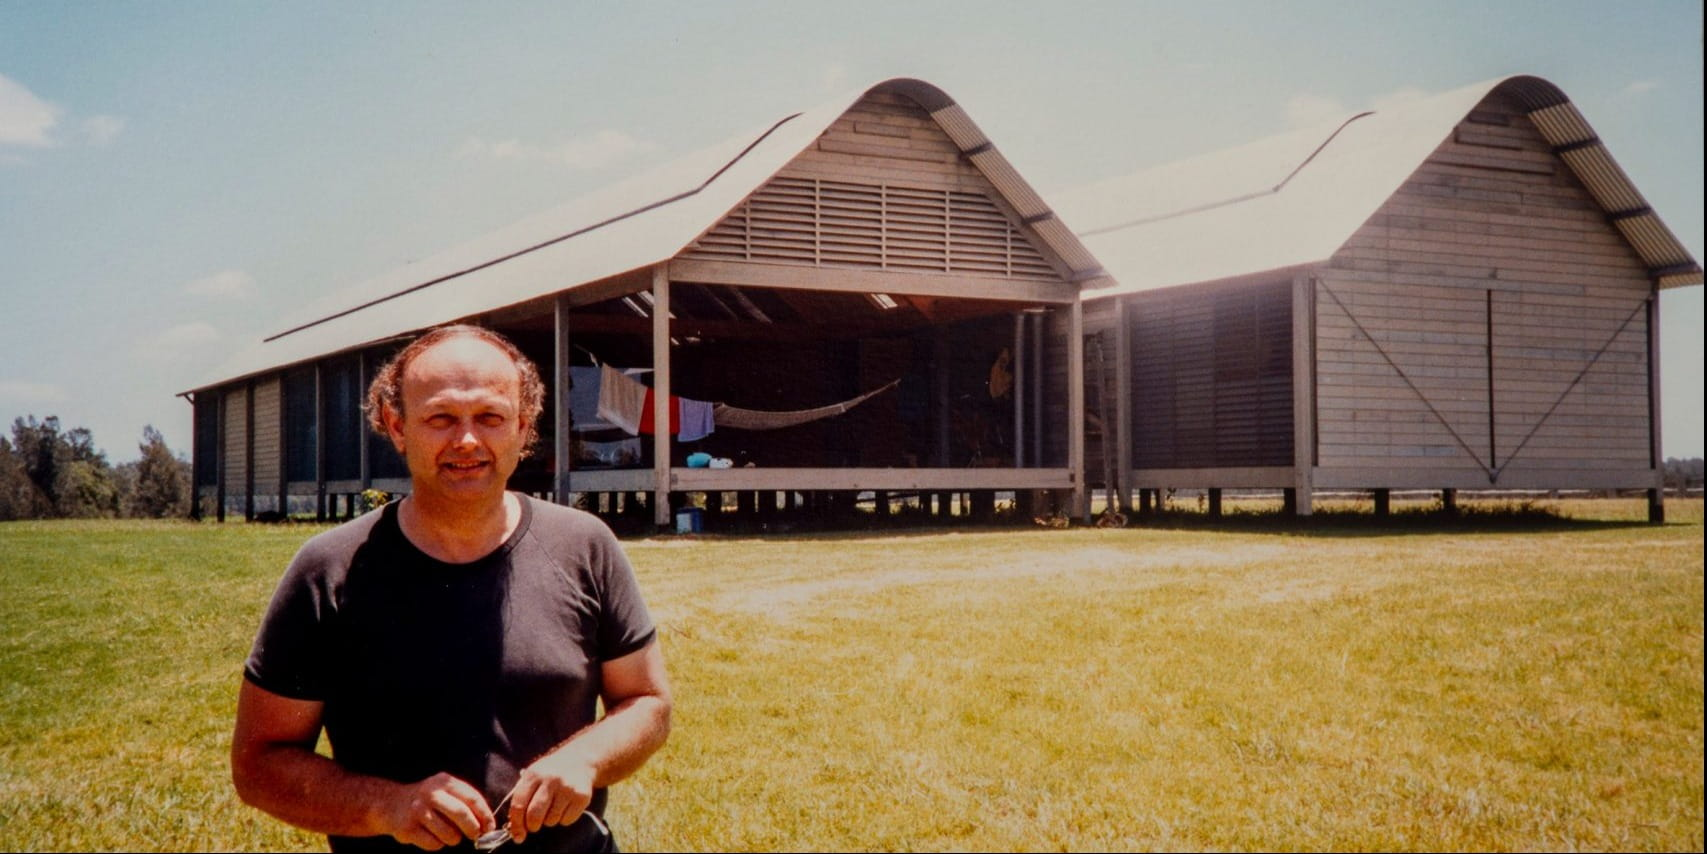 Glenn Murcutt is the first Australian to win Praemium Imperiale for architecture